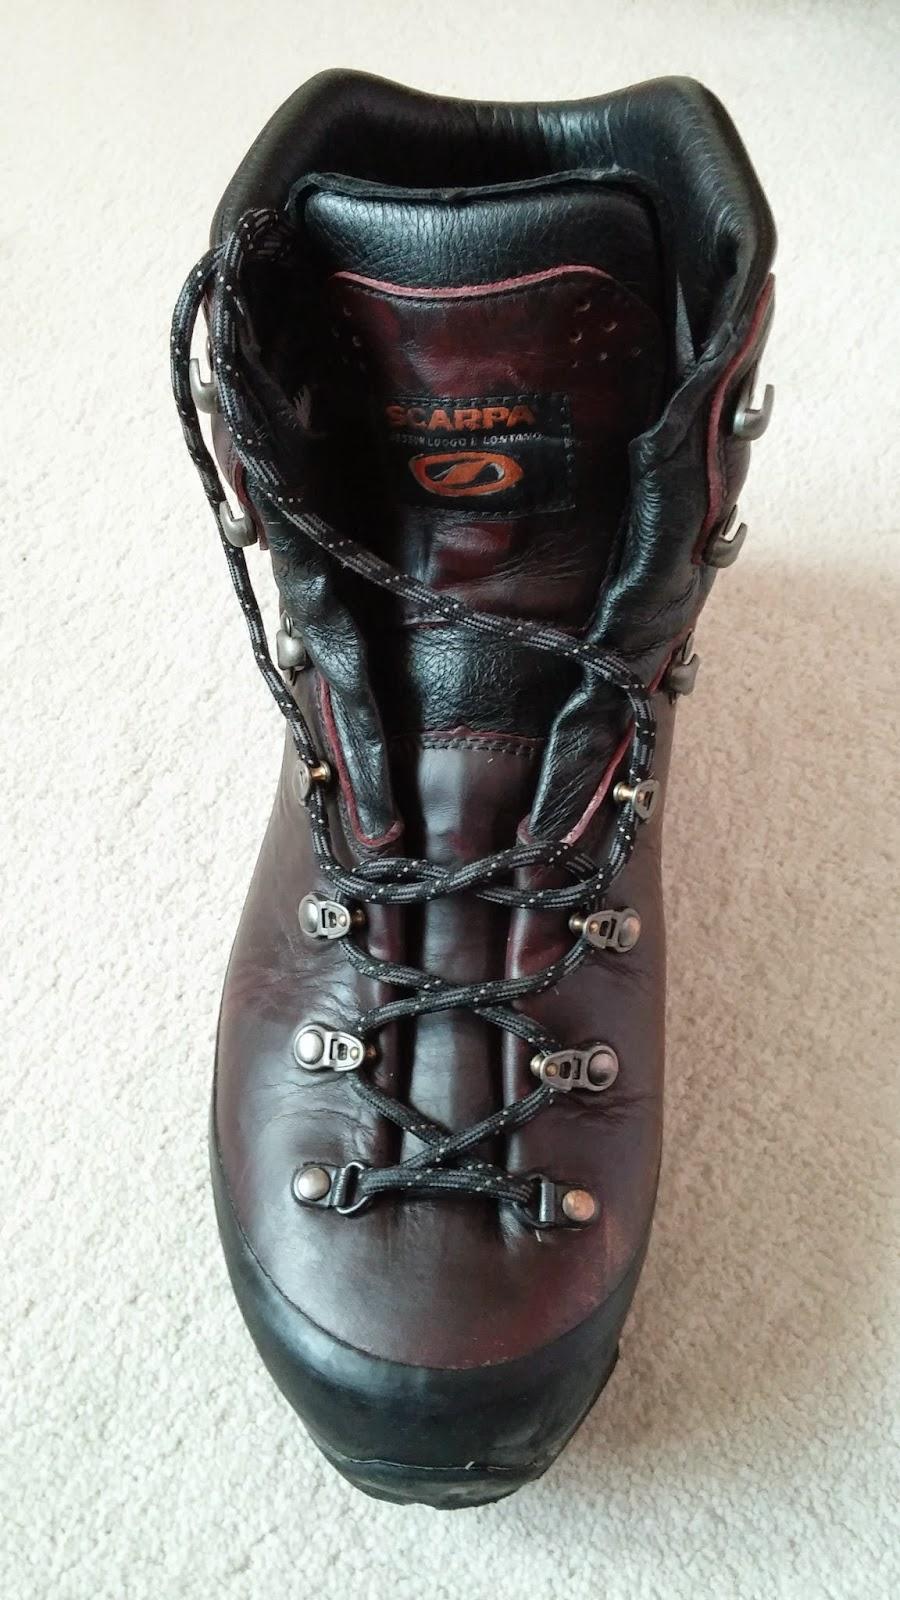 74fdbb84114 Outdoor Gear Reviews - Reviews of outdoor kit and gear: Scarpa Manta ...